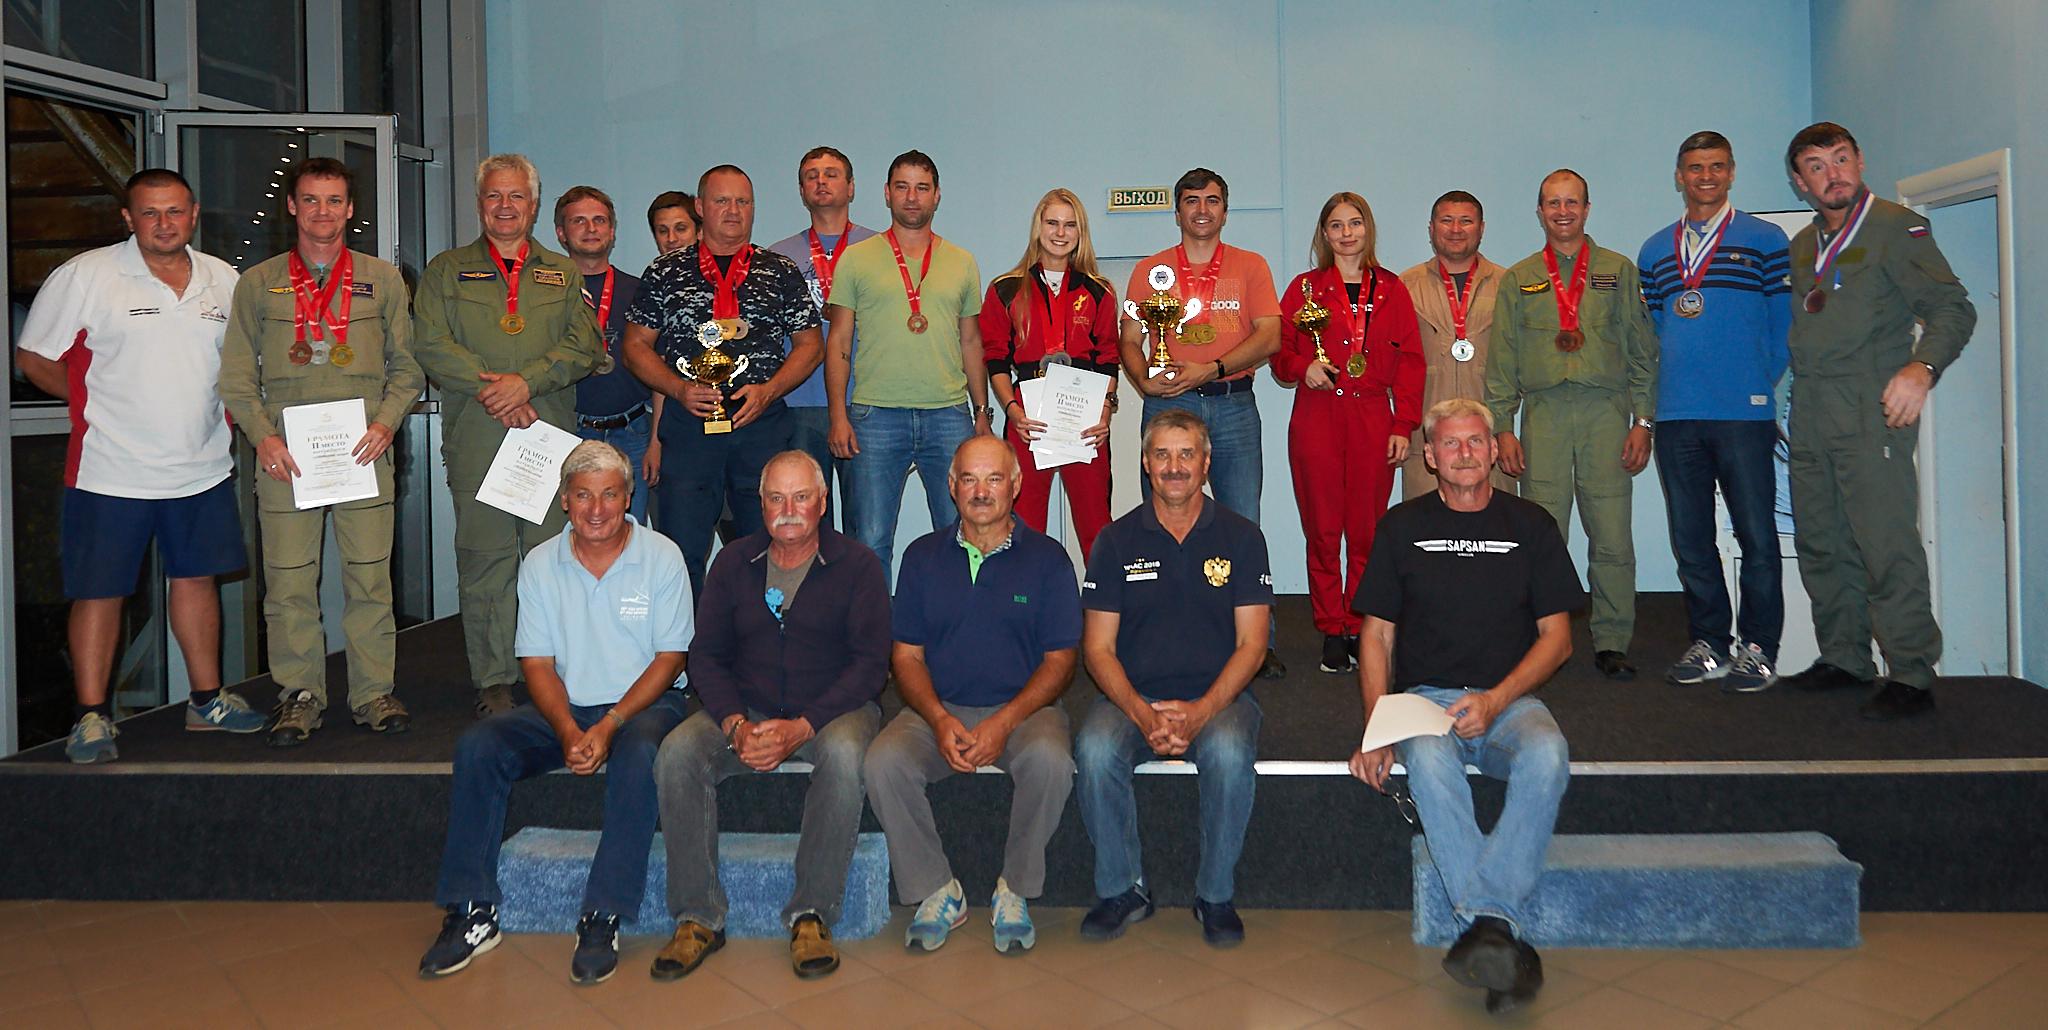 Some winners of  Moscow Region Open Aerobatics Championship 2020 ~ Часть победителей Чемпионата Московской Области 2020